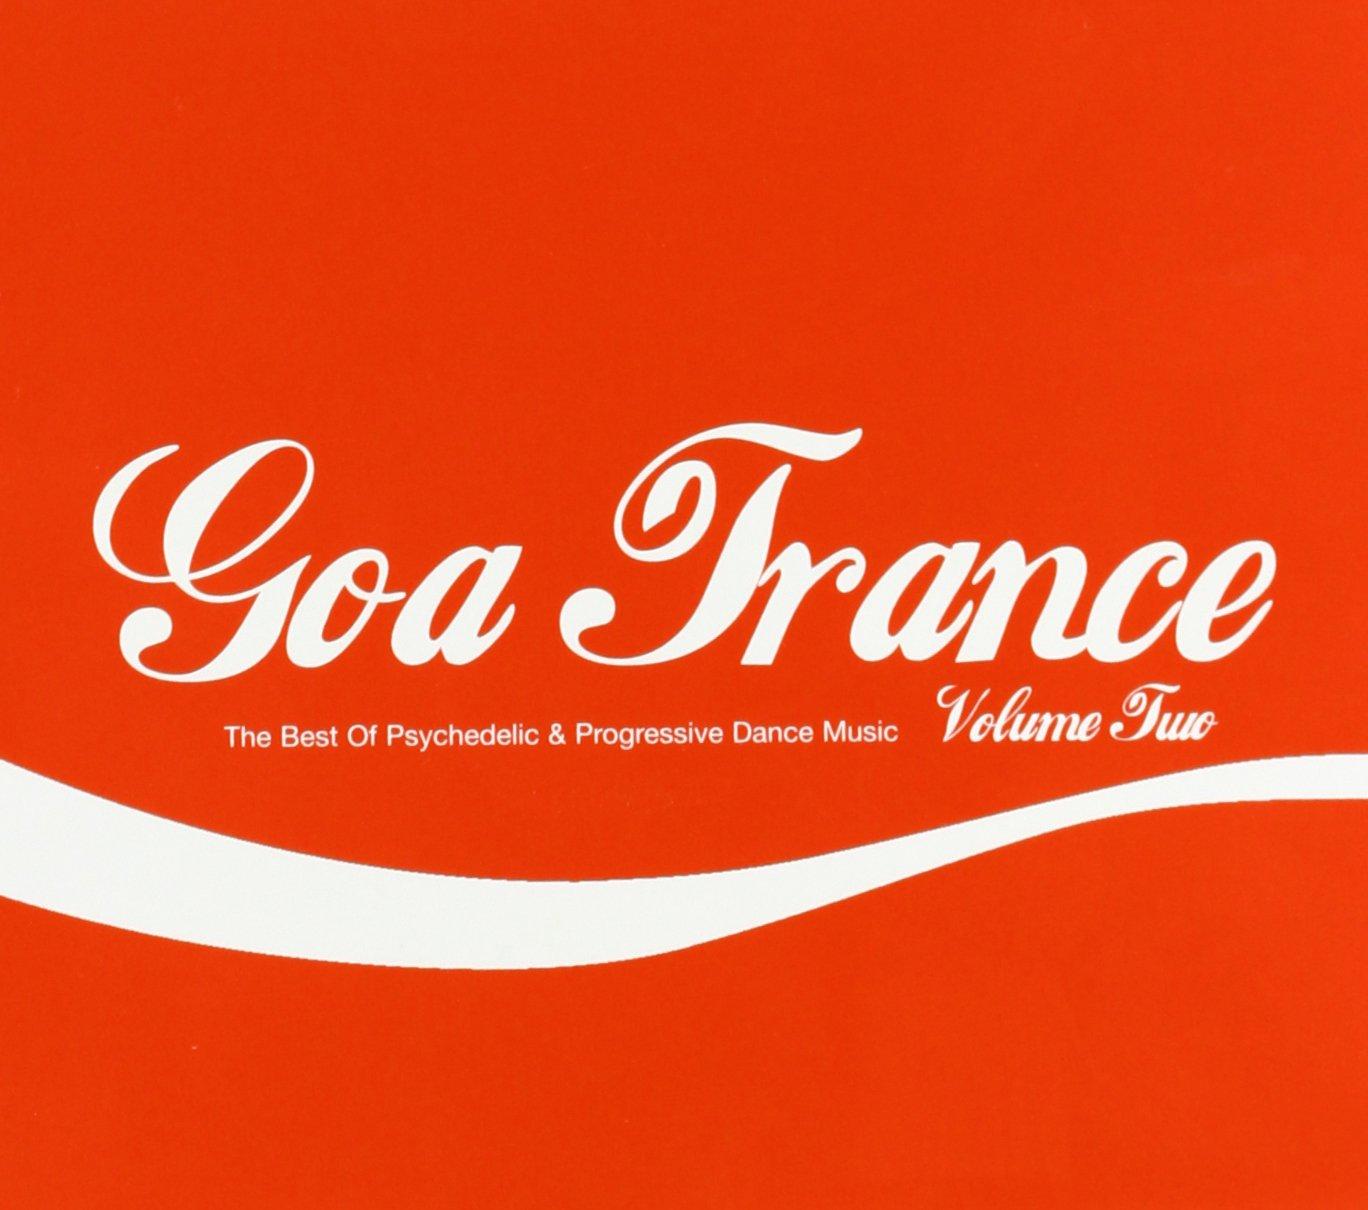 Goa Trance Vol.2                                                                                                                                                                                                                                                    <span class=